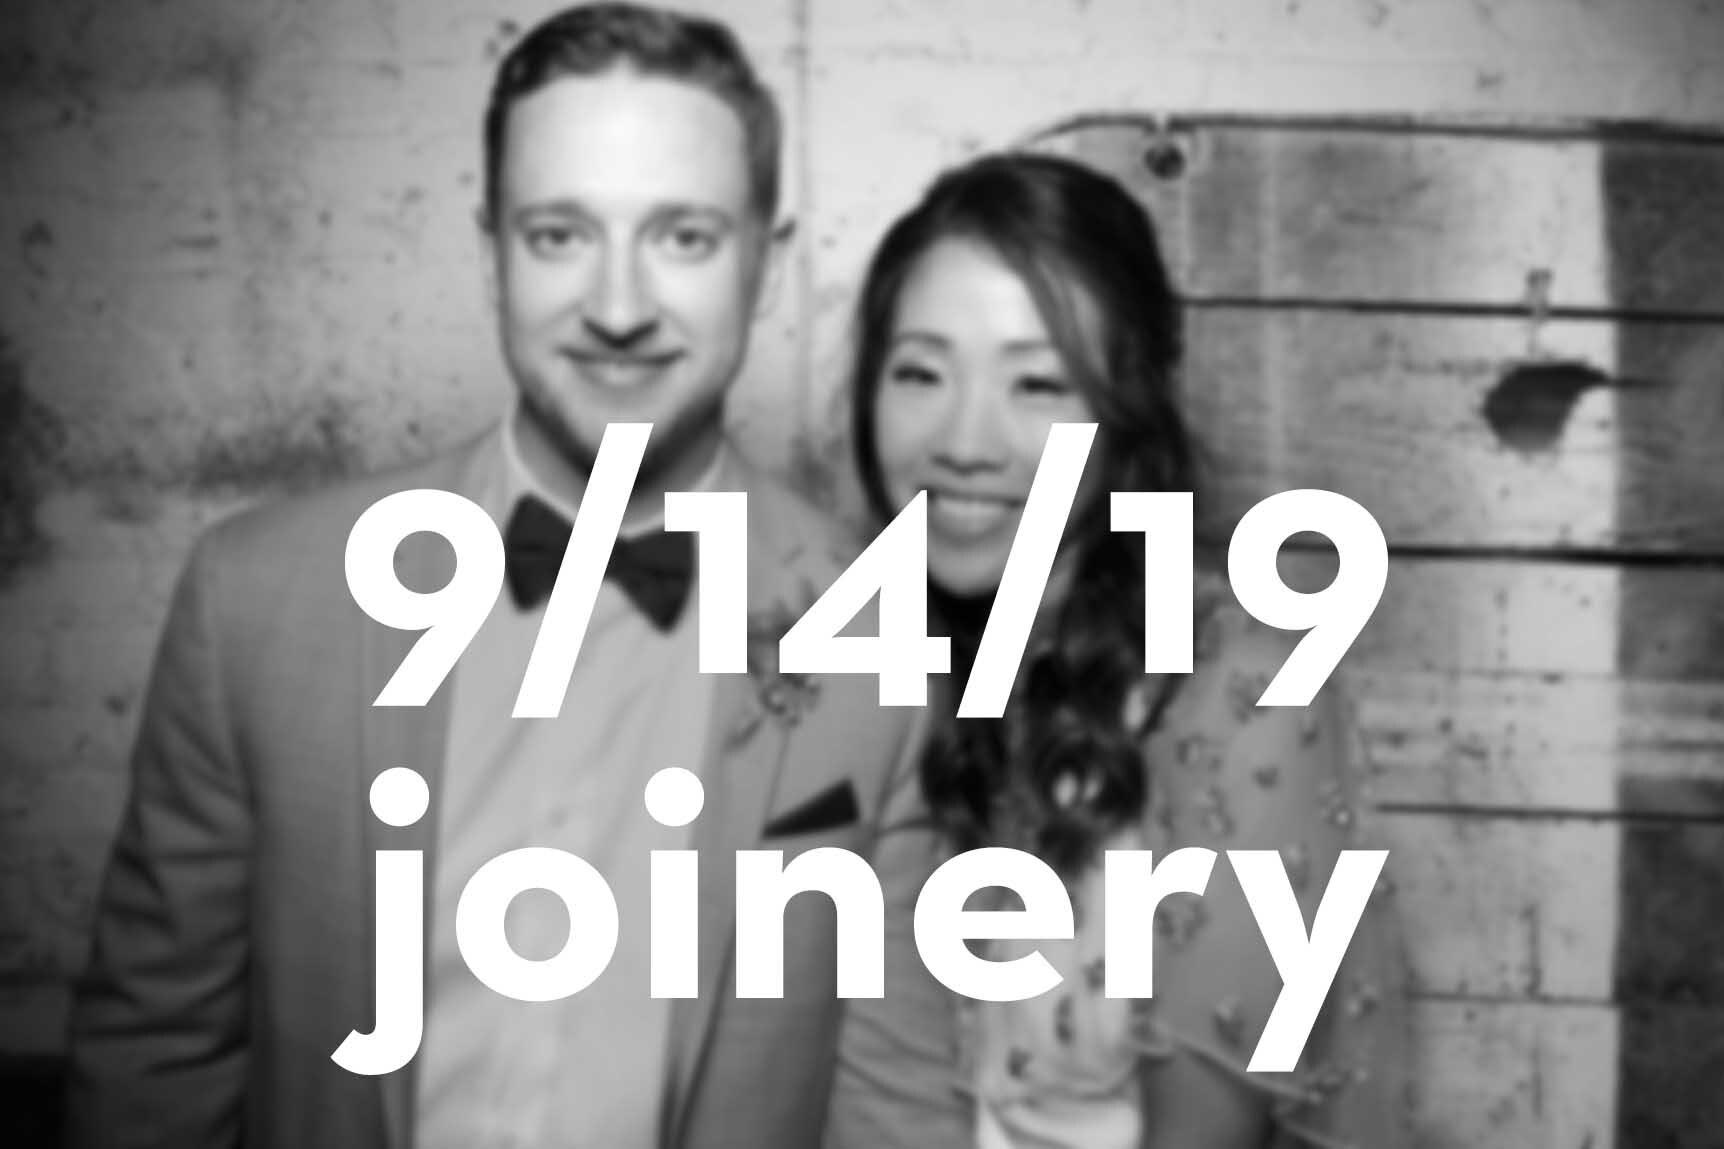 091419_joinery.jpg